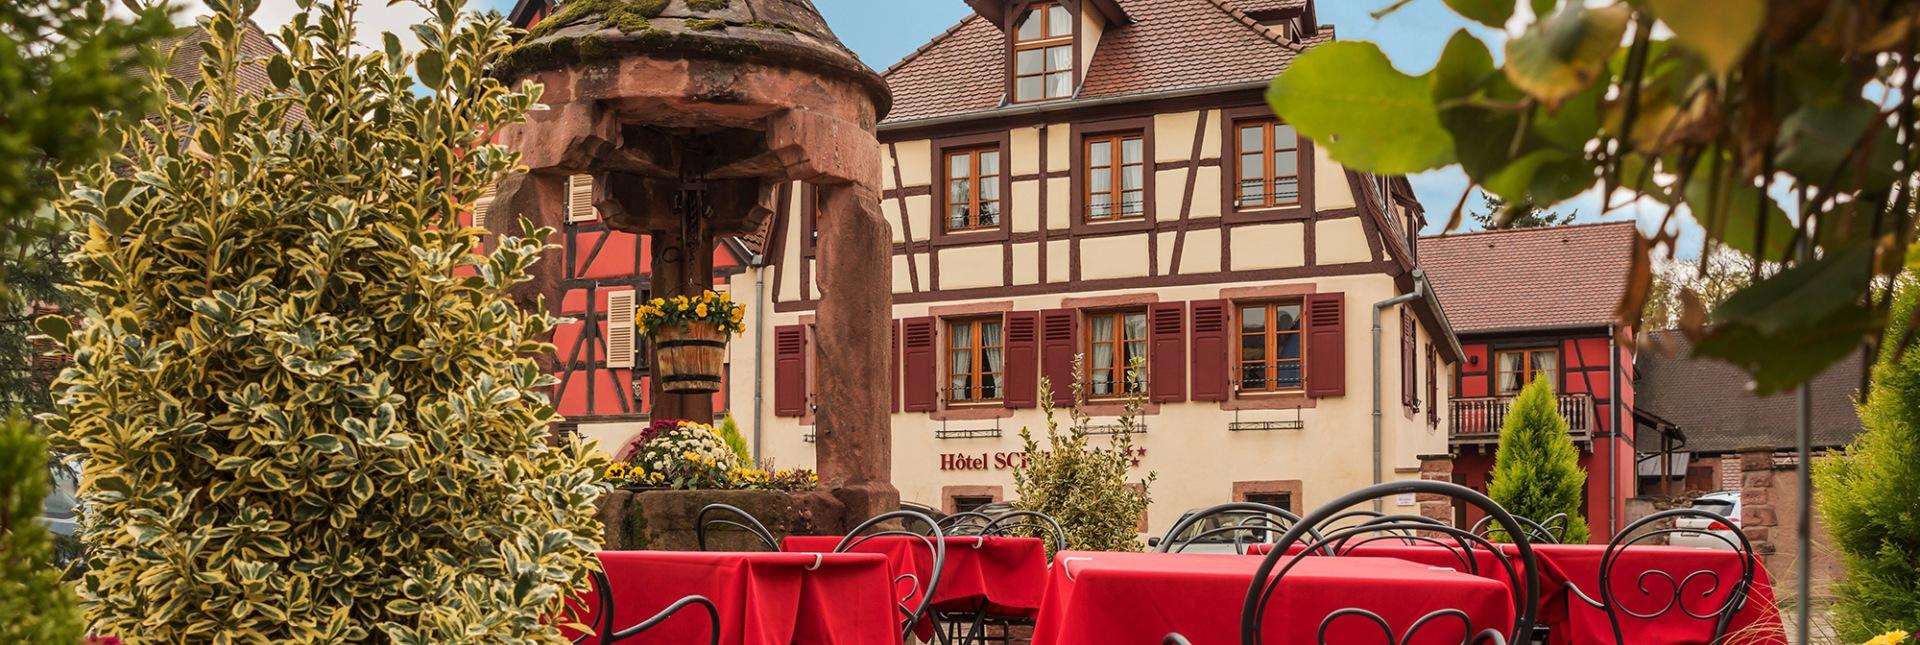 Hôtel Schwendi et sa terrasse